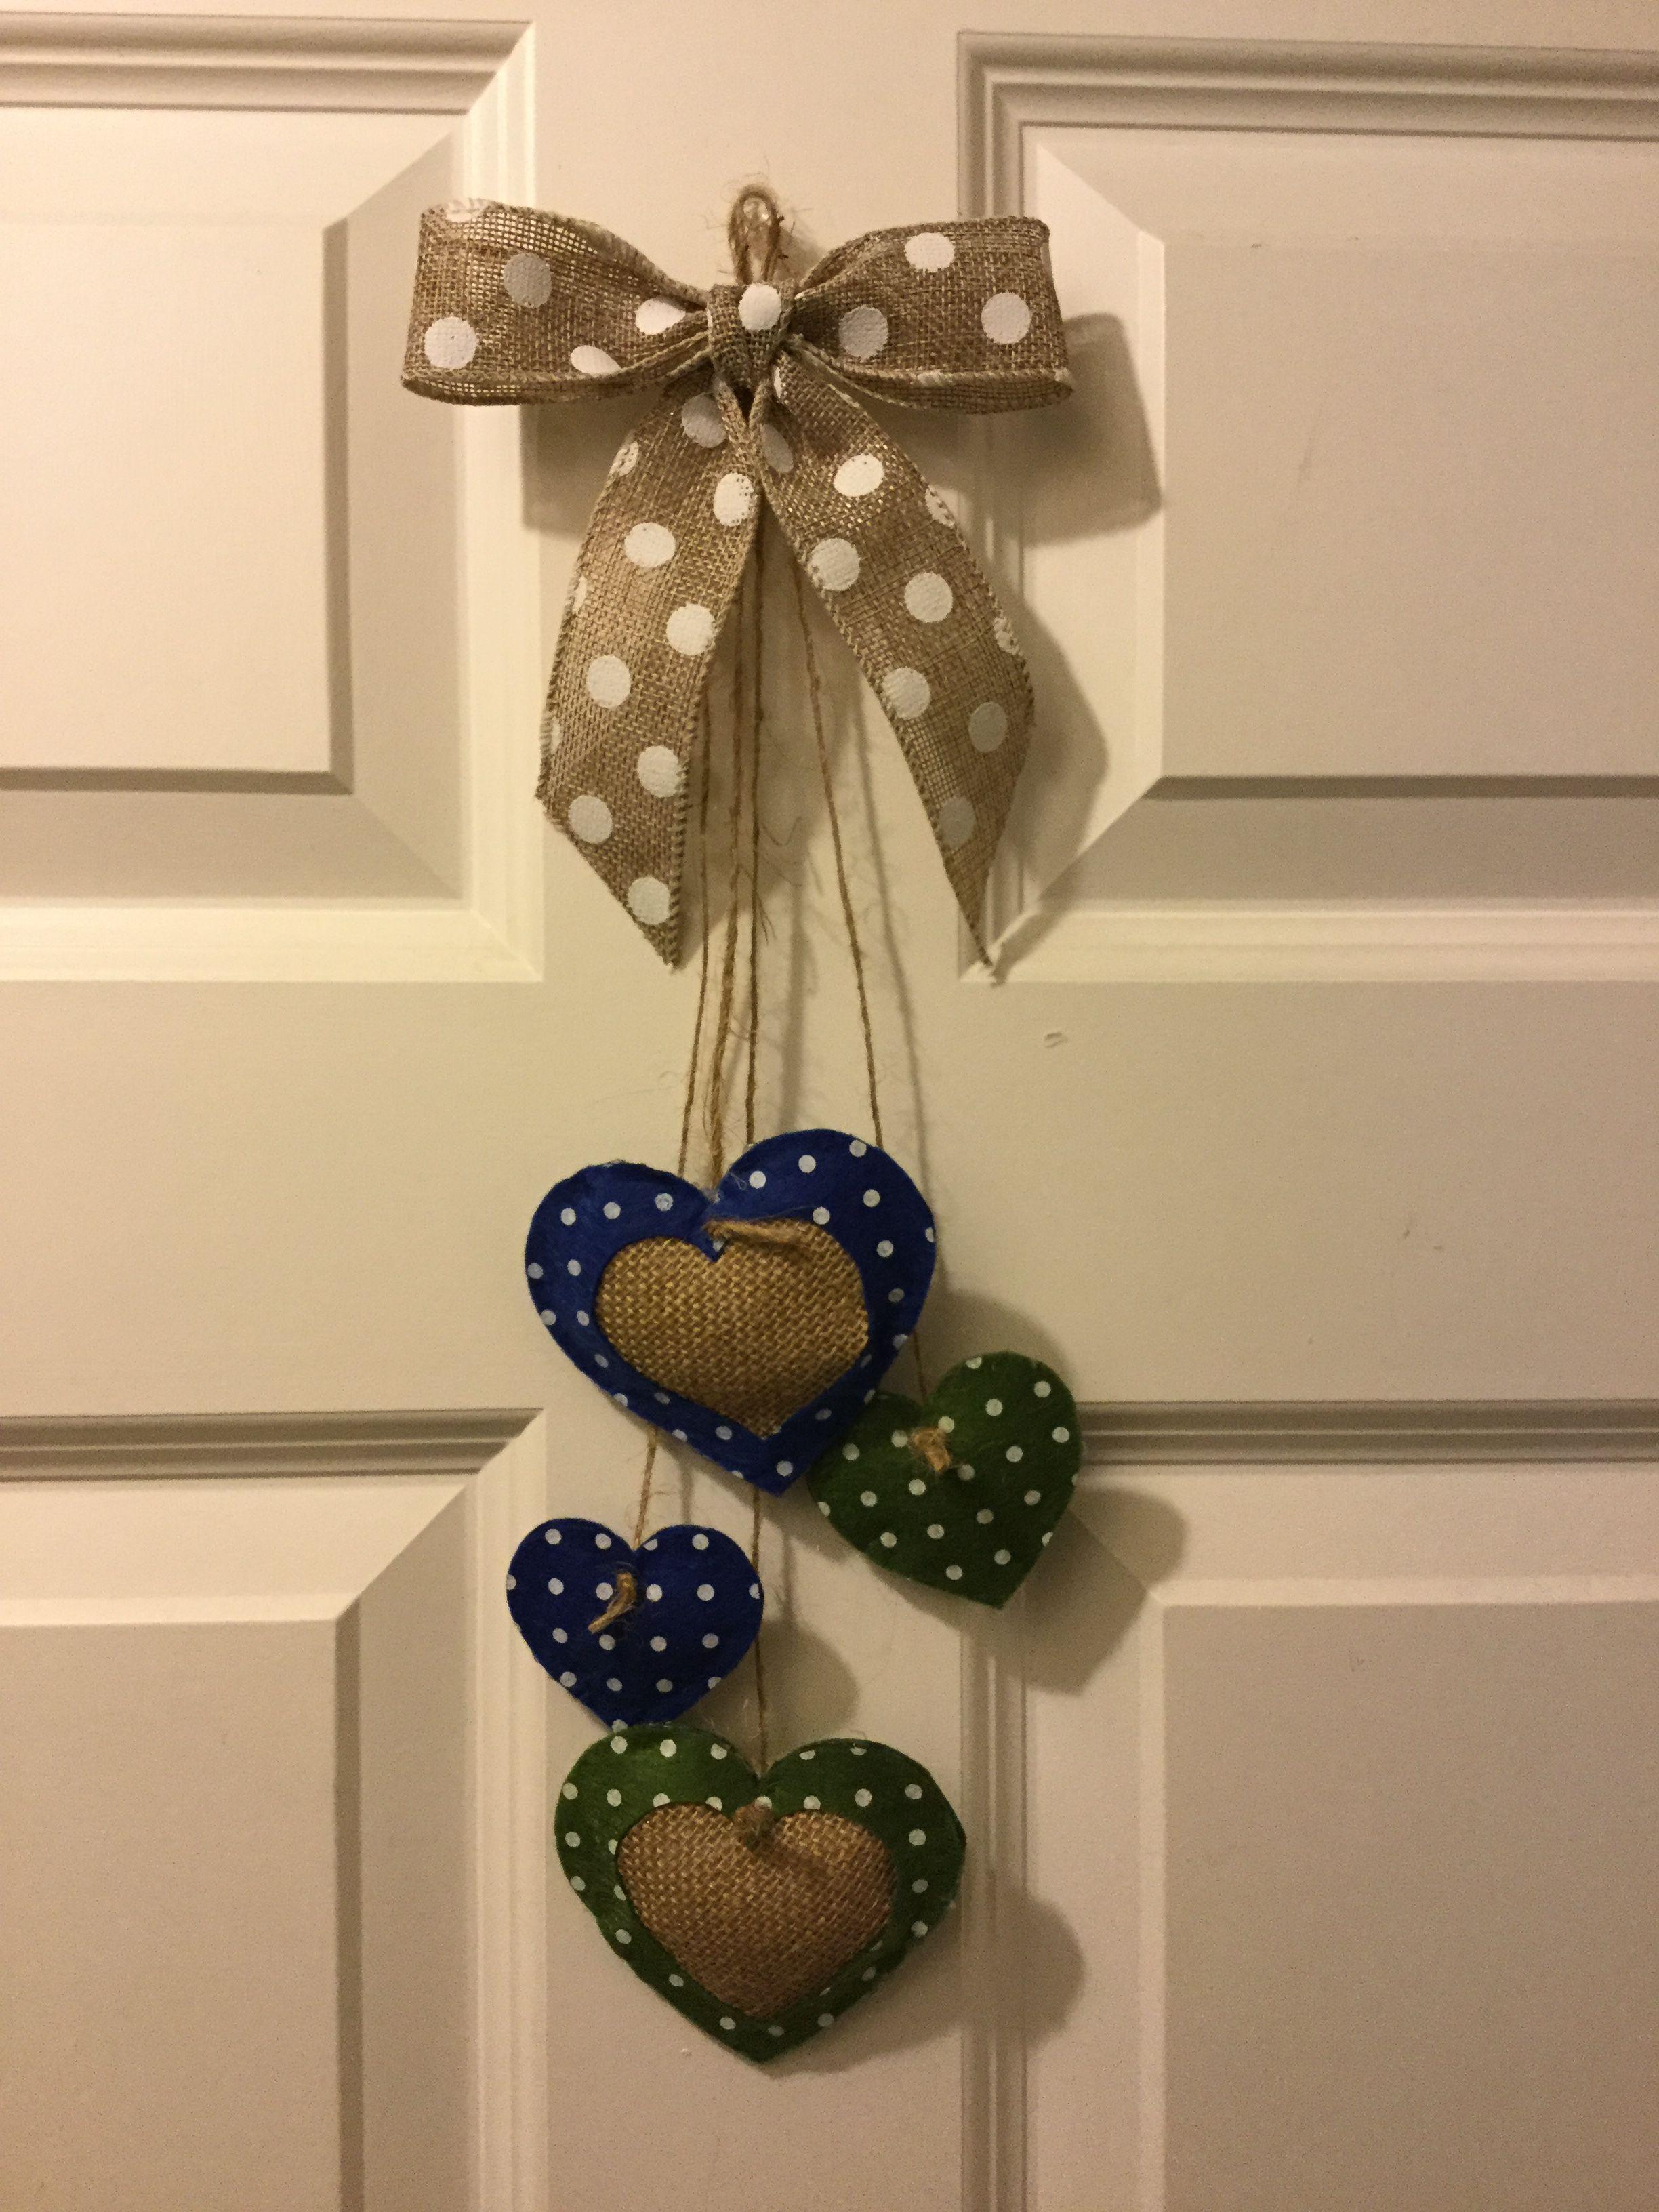 Felt and burlap hearts wall hanging door decoration | Lisa Reed ...